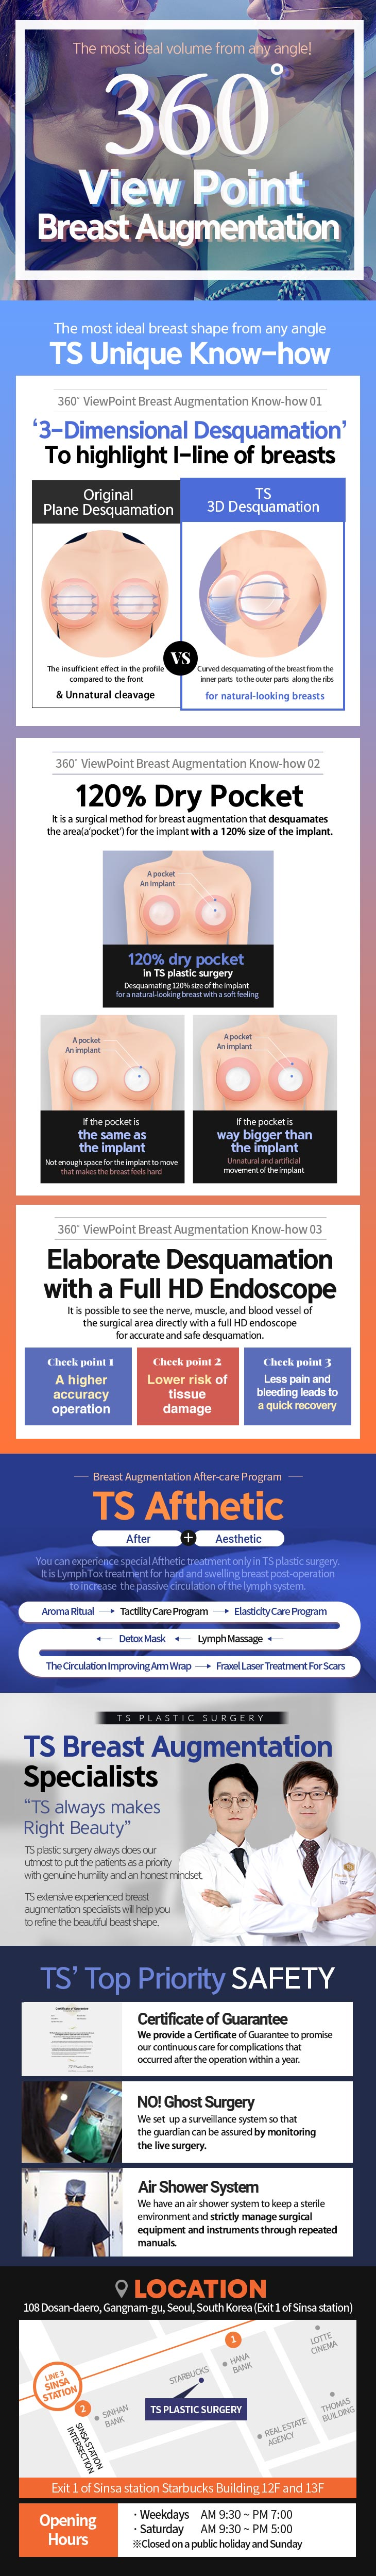 TS 360' ViewPoint Breast Augmentation